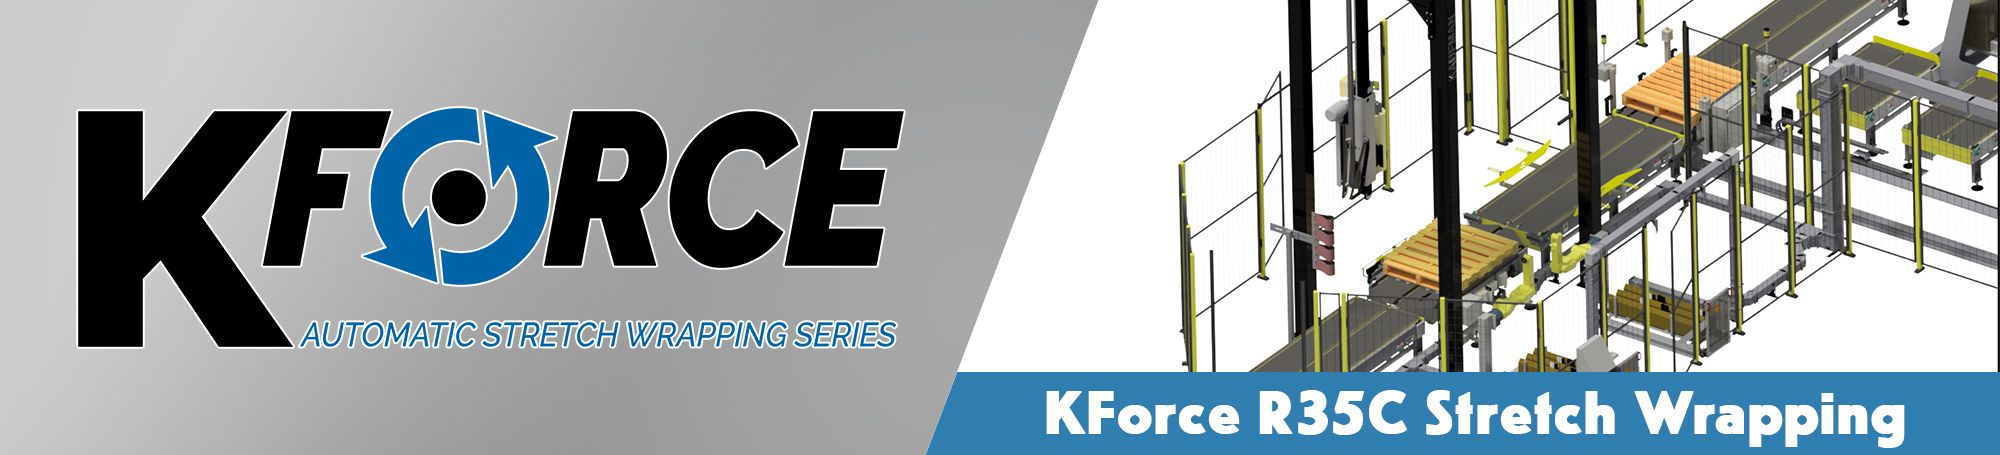 KForce R35C Wrapper.jpg